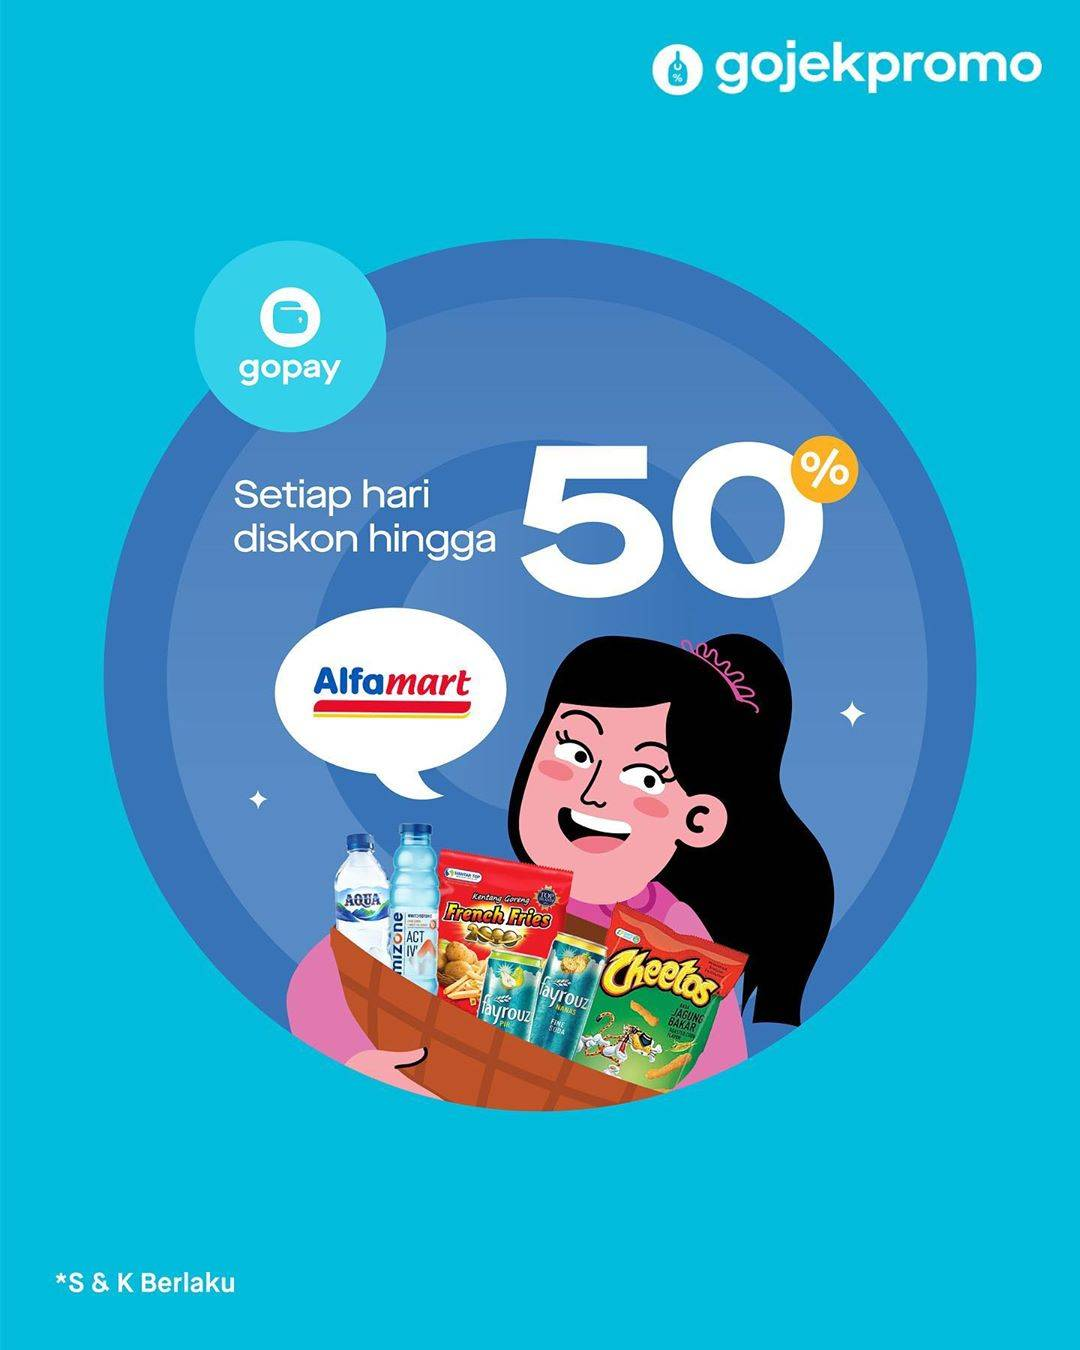 Alfamart diskon hingga 50% pakai GoPay